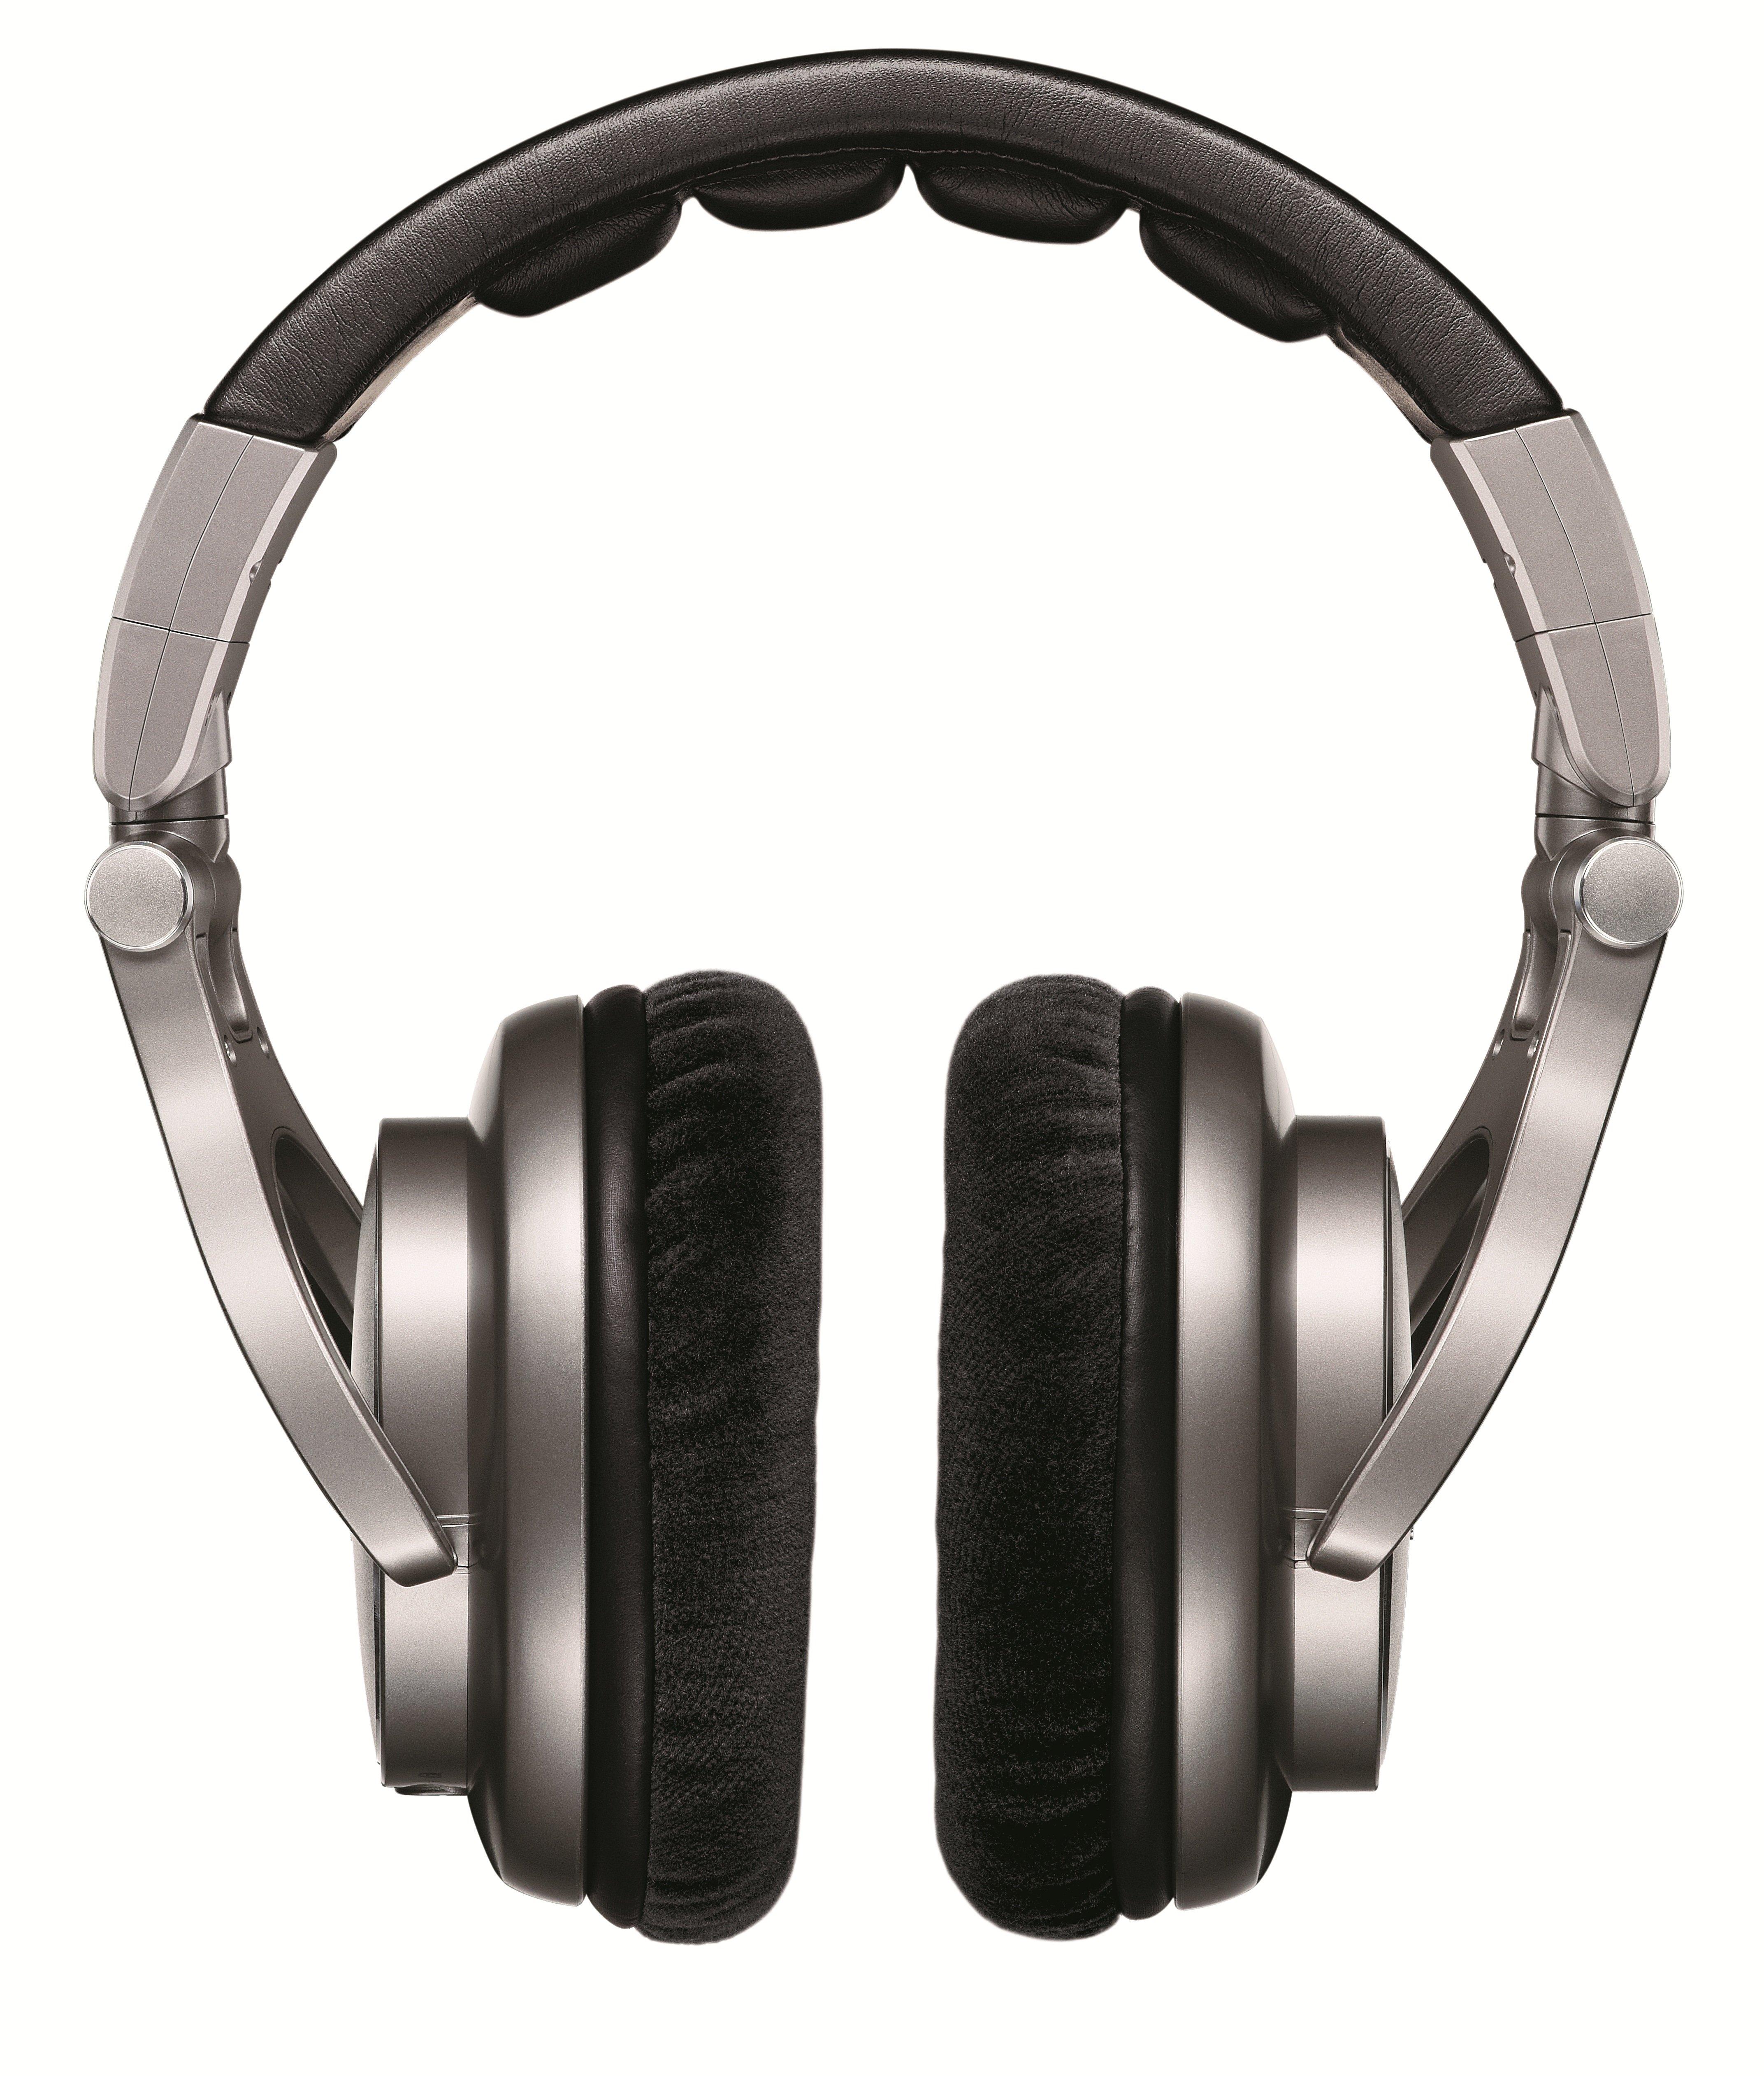 Amazon.com: Shure SRH940 Professional Reference Headphones